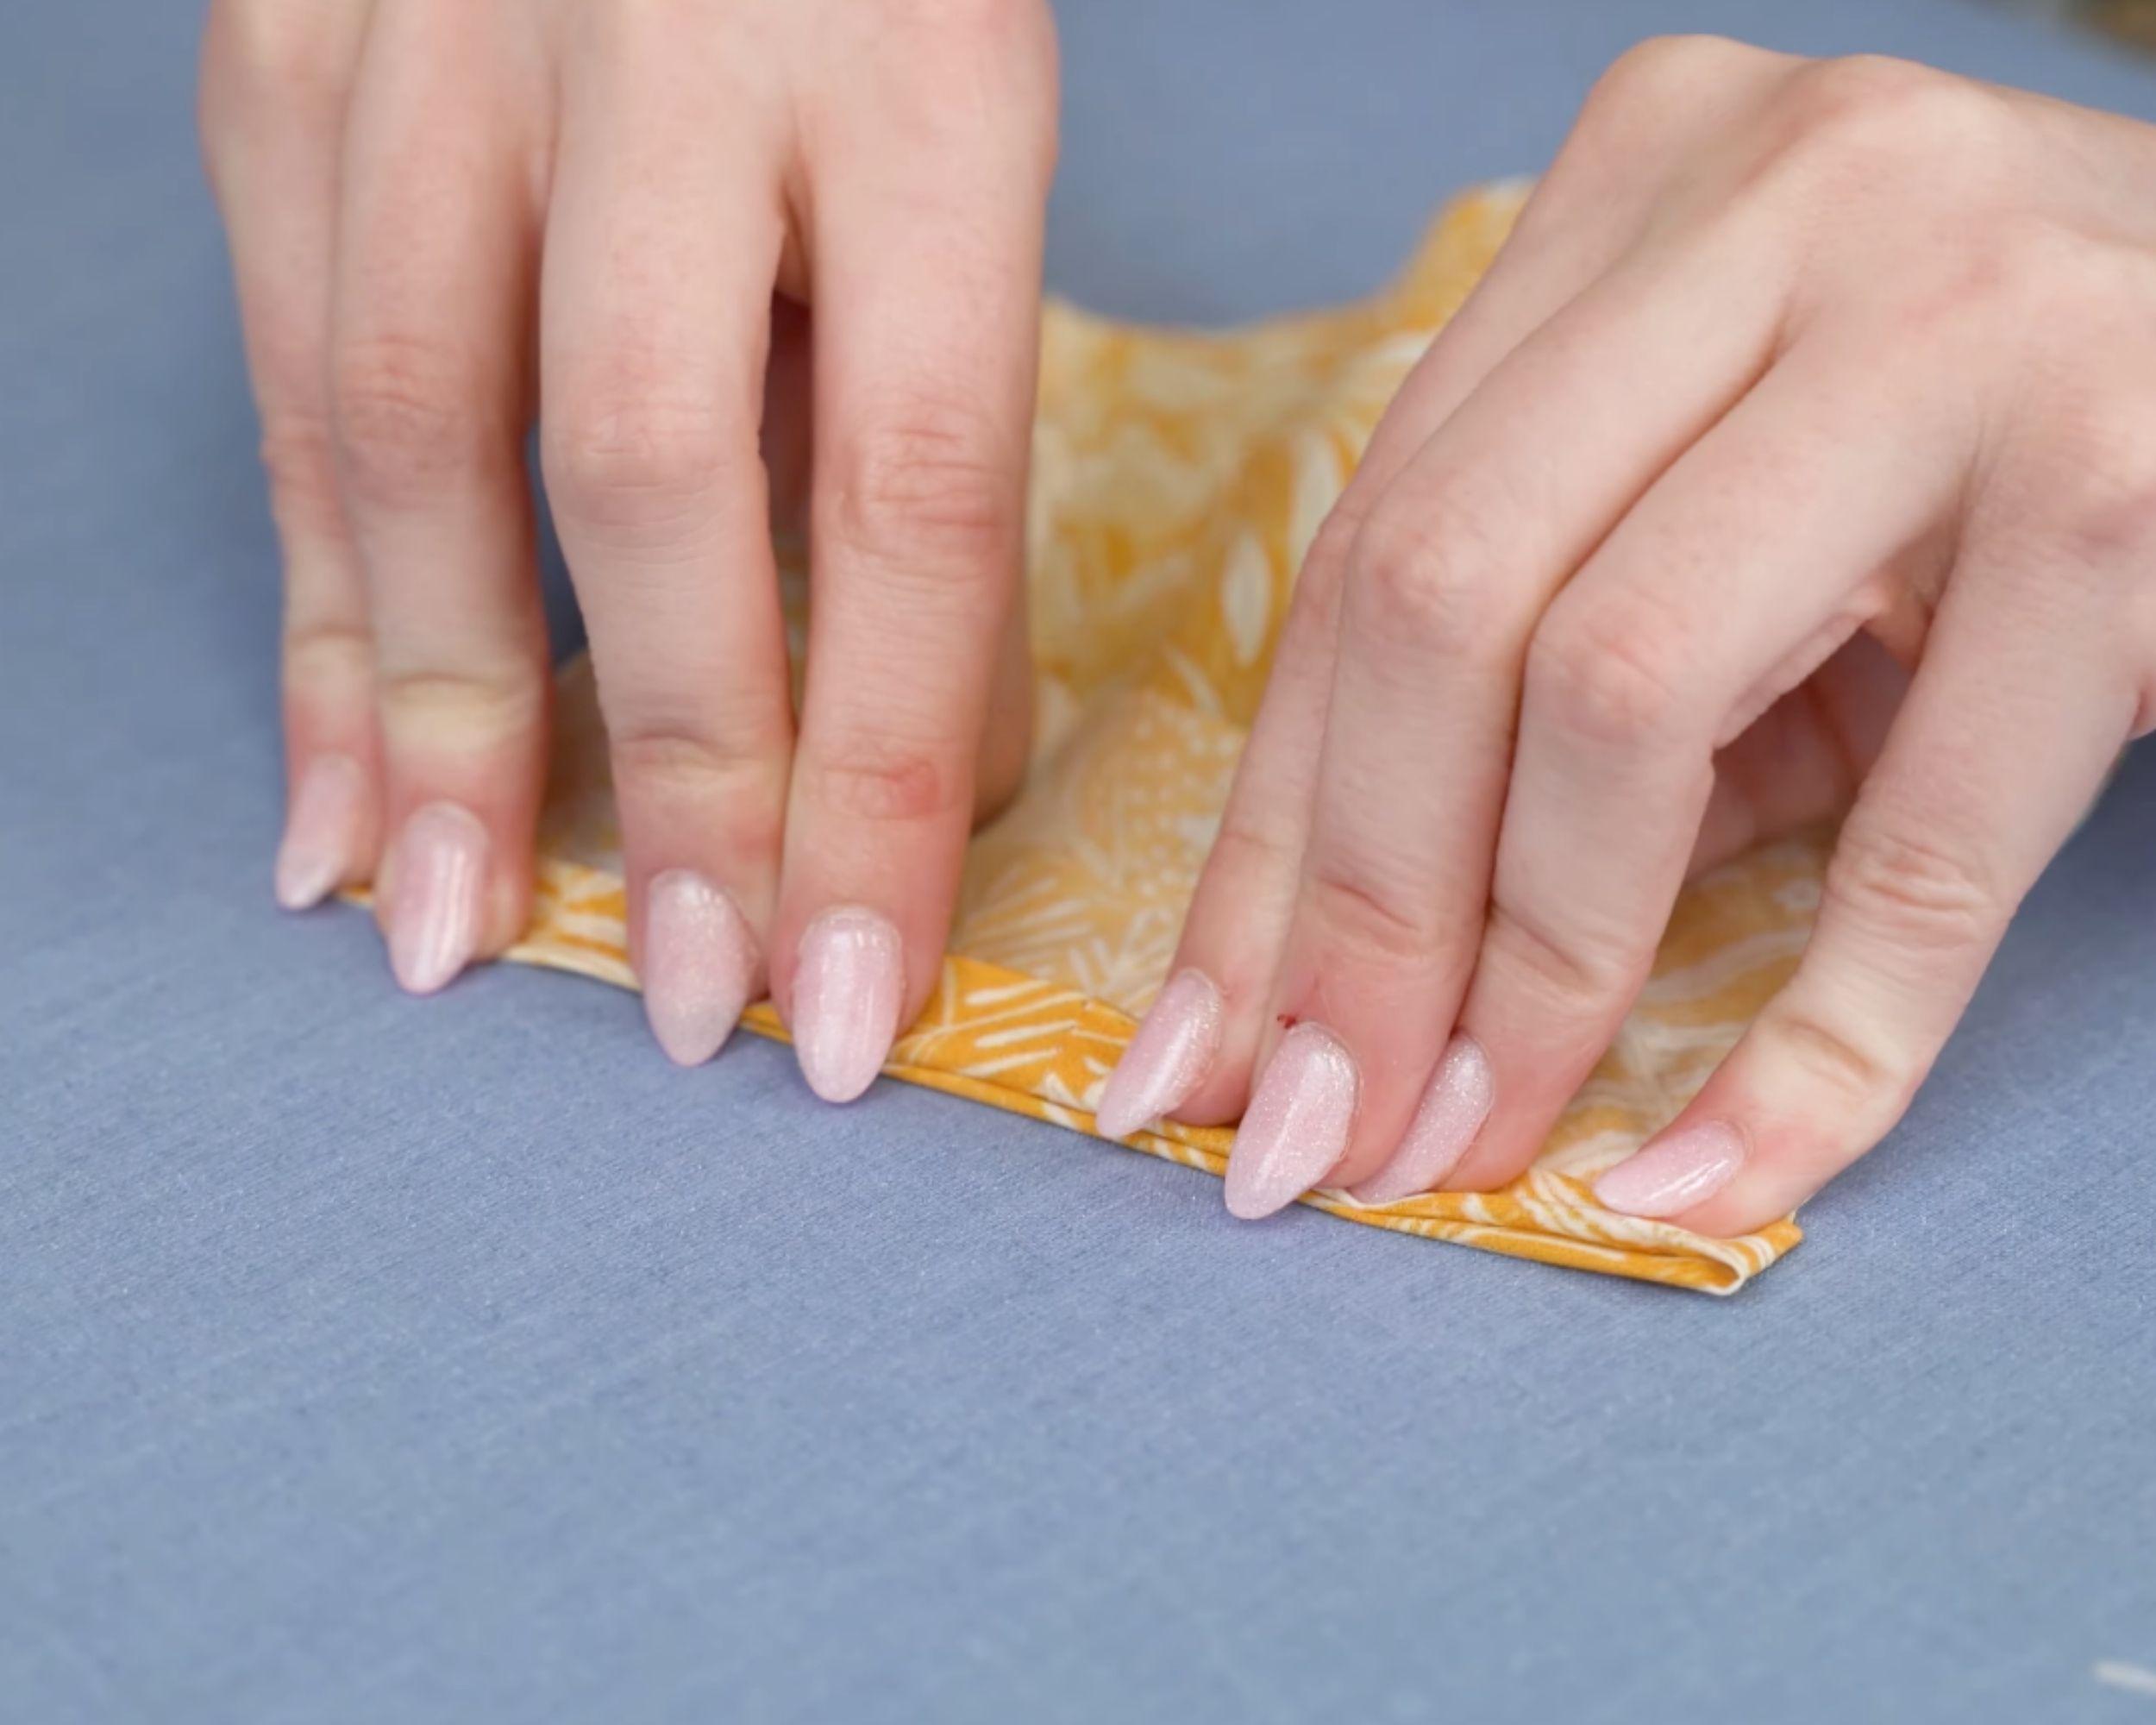 Hemming the sleeve's edge